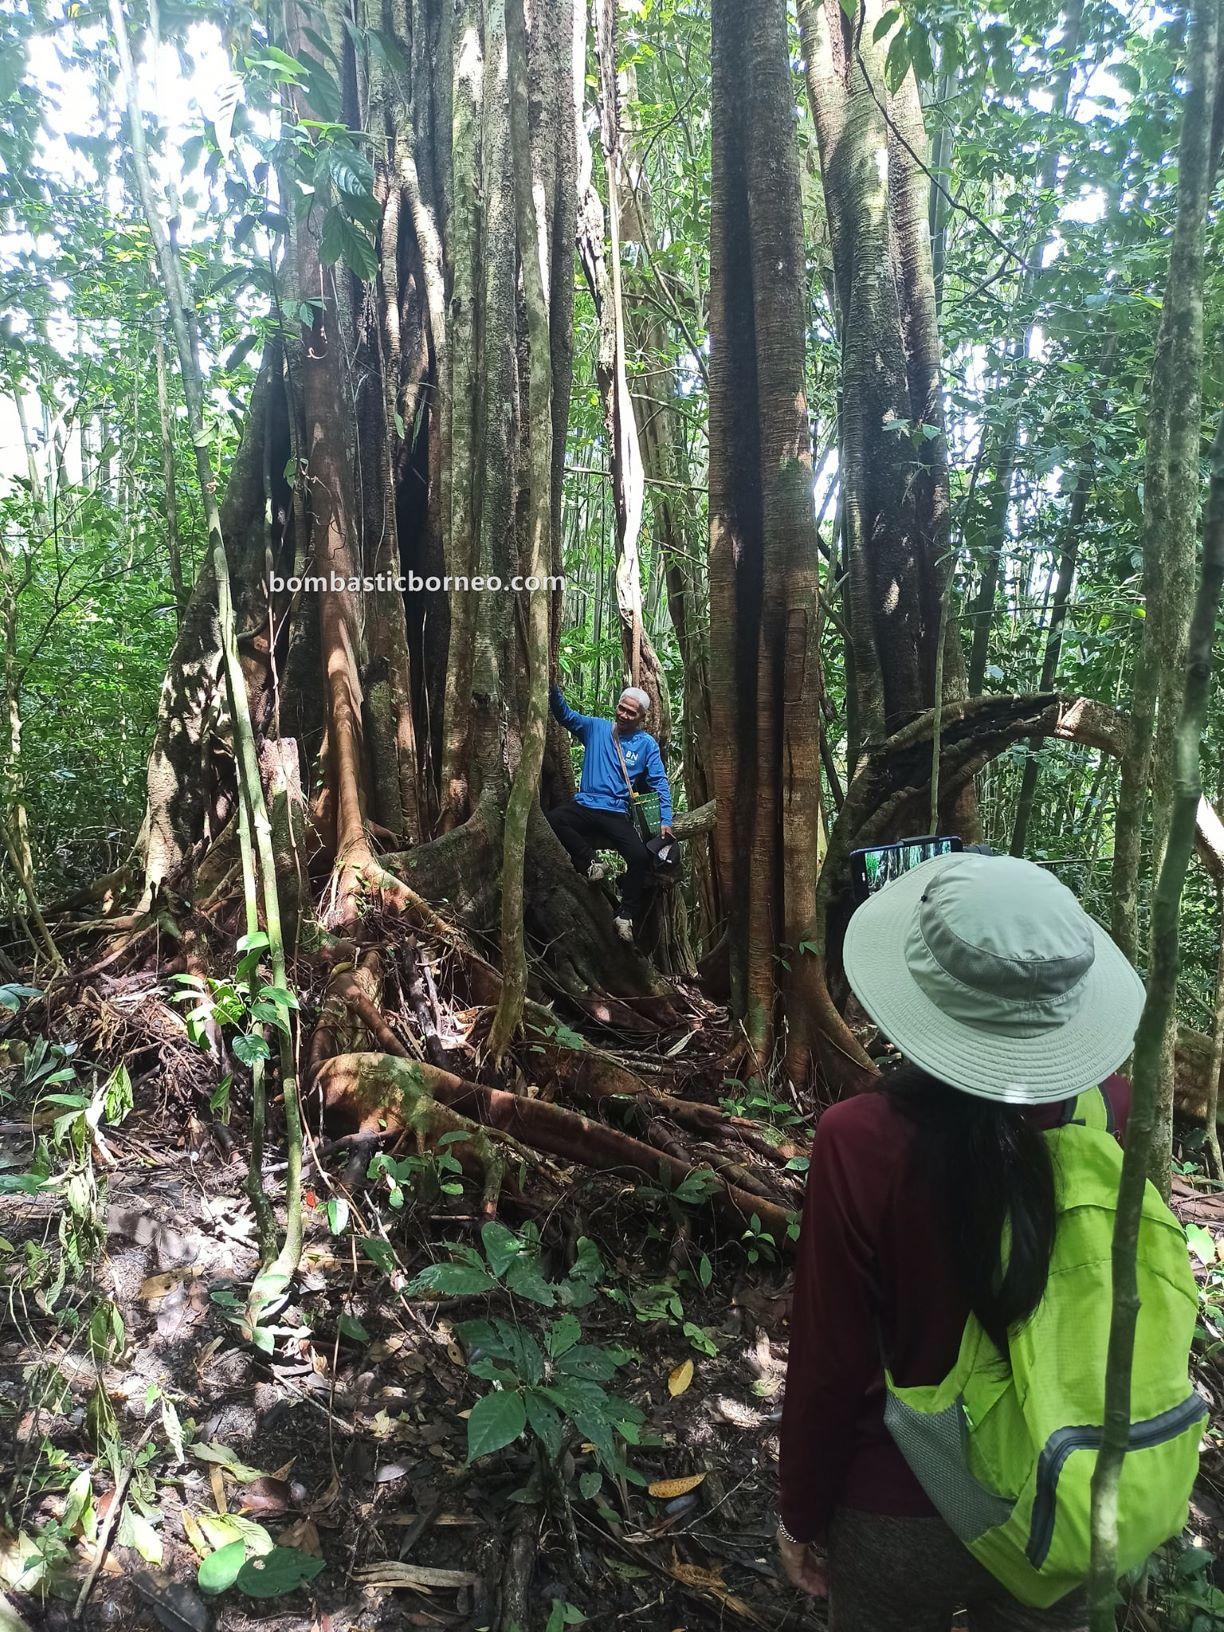 Bung Mawang, Kampung Gayu, rainforest, adventure, outdoor, jungle trekking, hiking, exploration, Padawan, Kuching, Tourism, tourist attraction, 探索婆罗洲游踪, 马来西亚砂拉越, 古晋热带雨林徒步